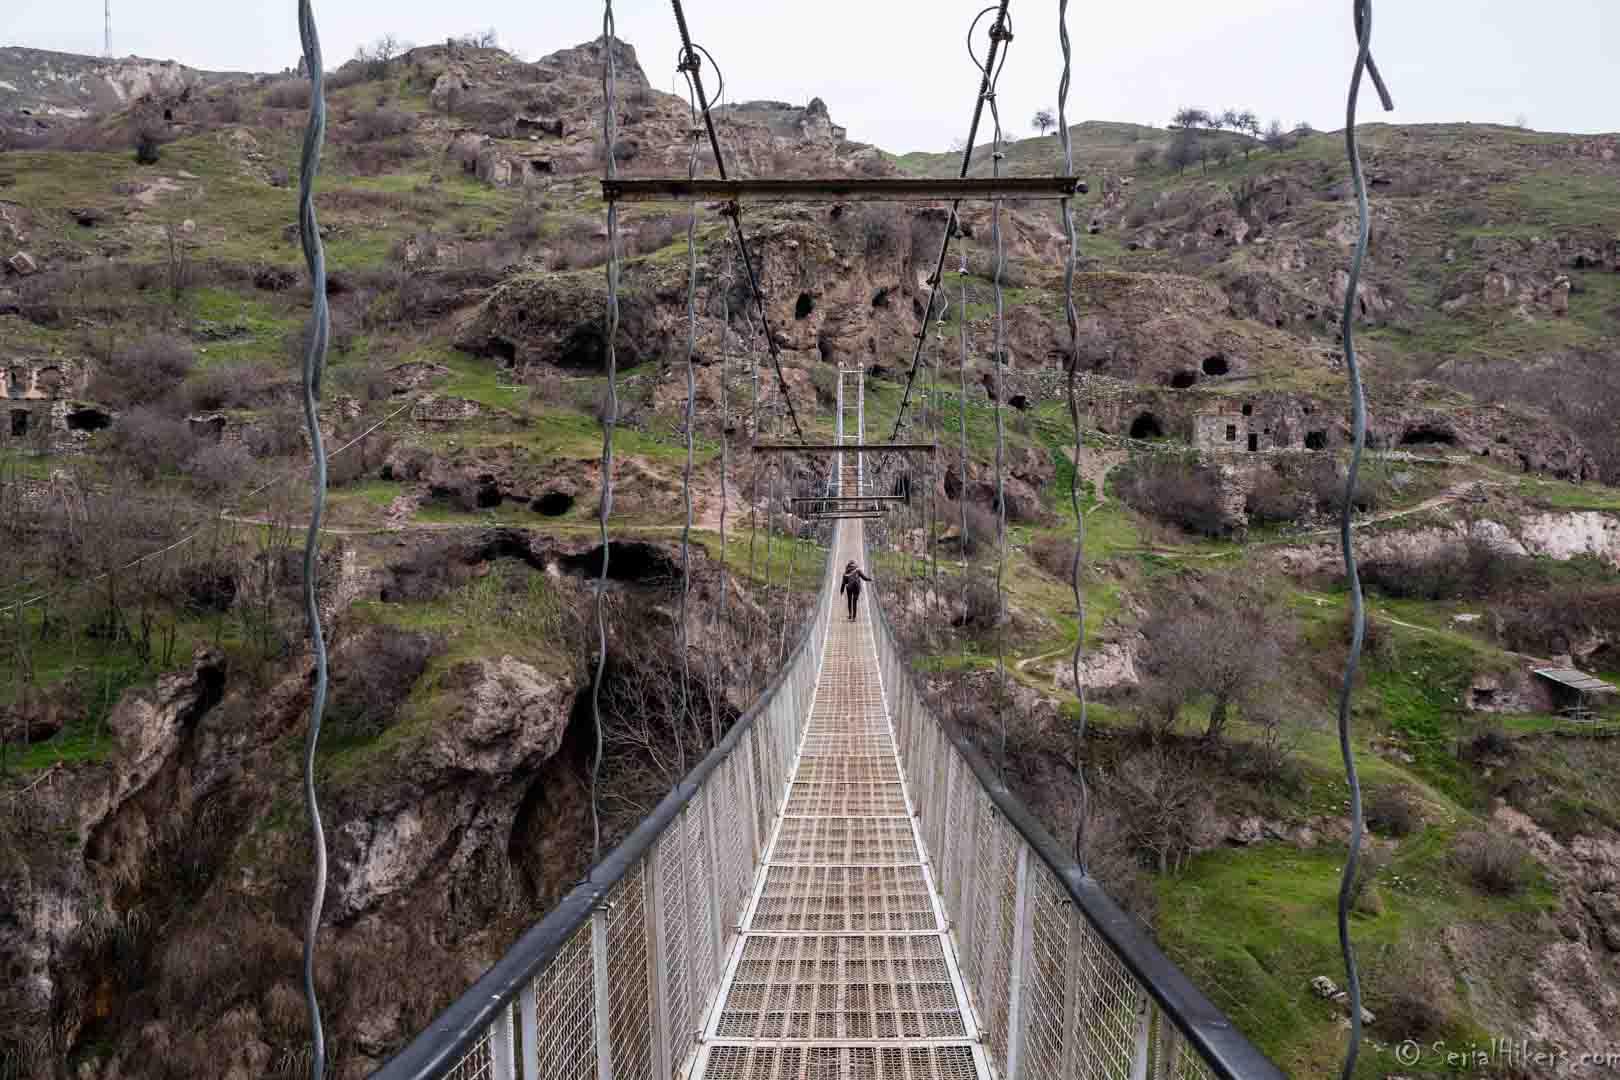 SerialHikers stop autostop world monde tour hitchhiking aventure adventure alternative travel voyage sans avion no fly Khndzoresk swing bridge pont suspendu caucase armenia armenie monastery monastère